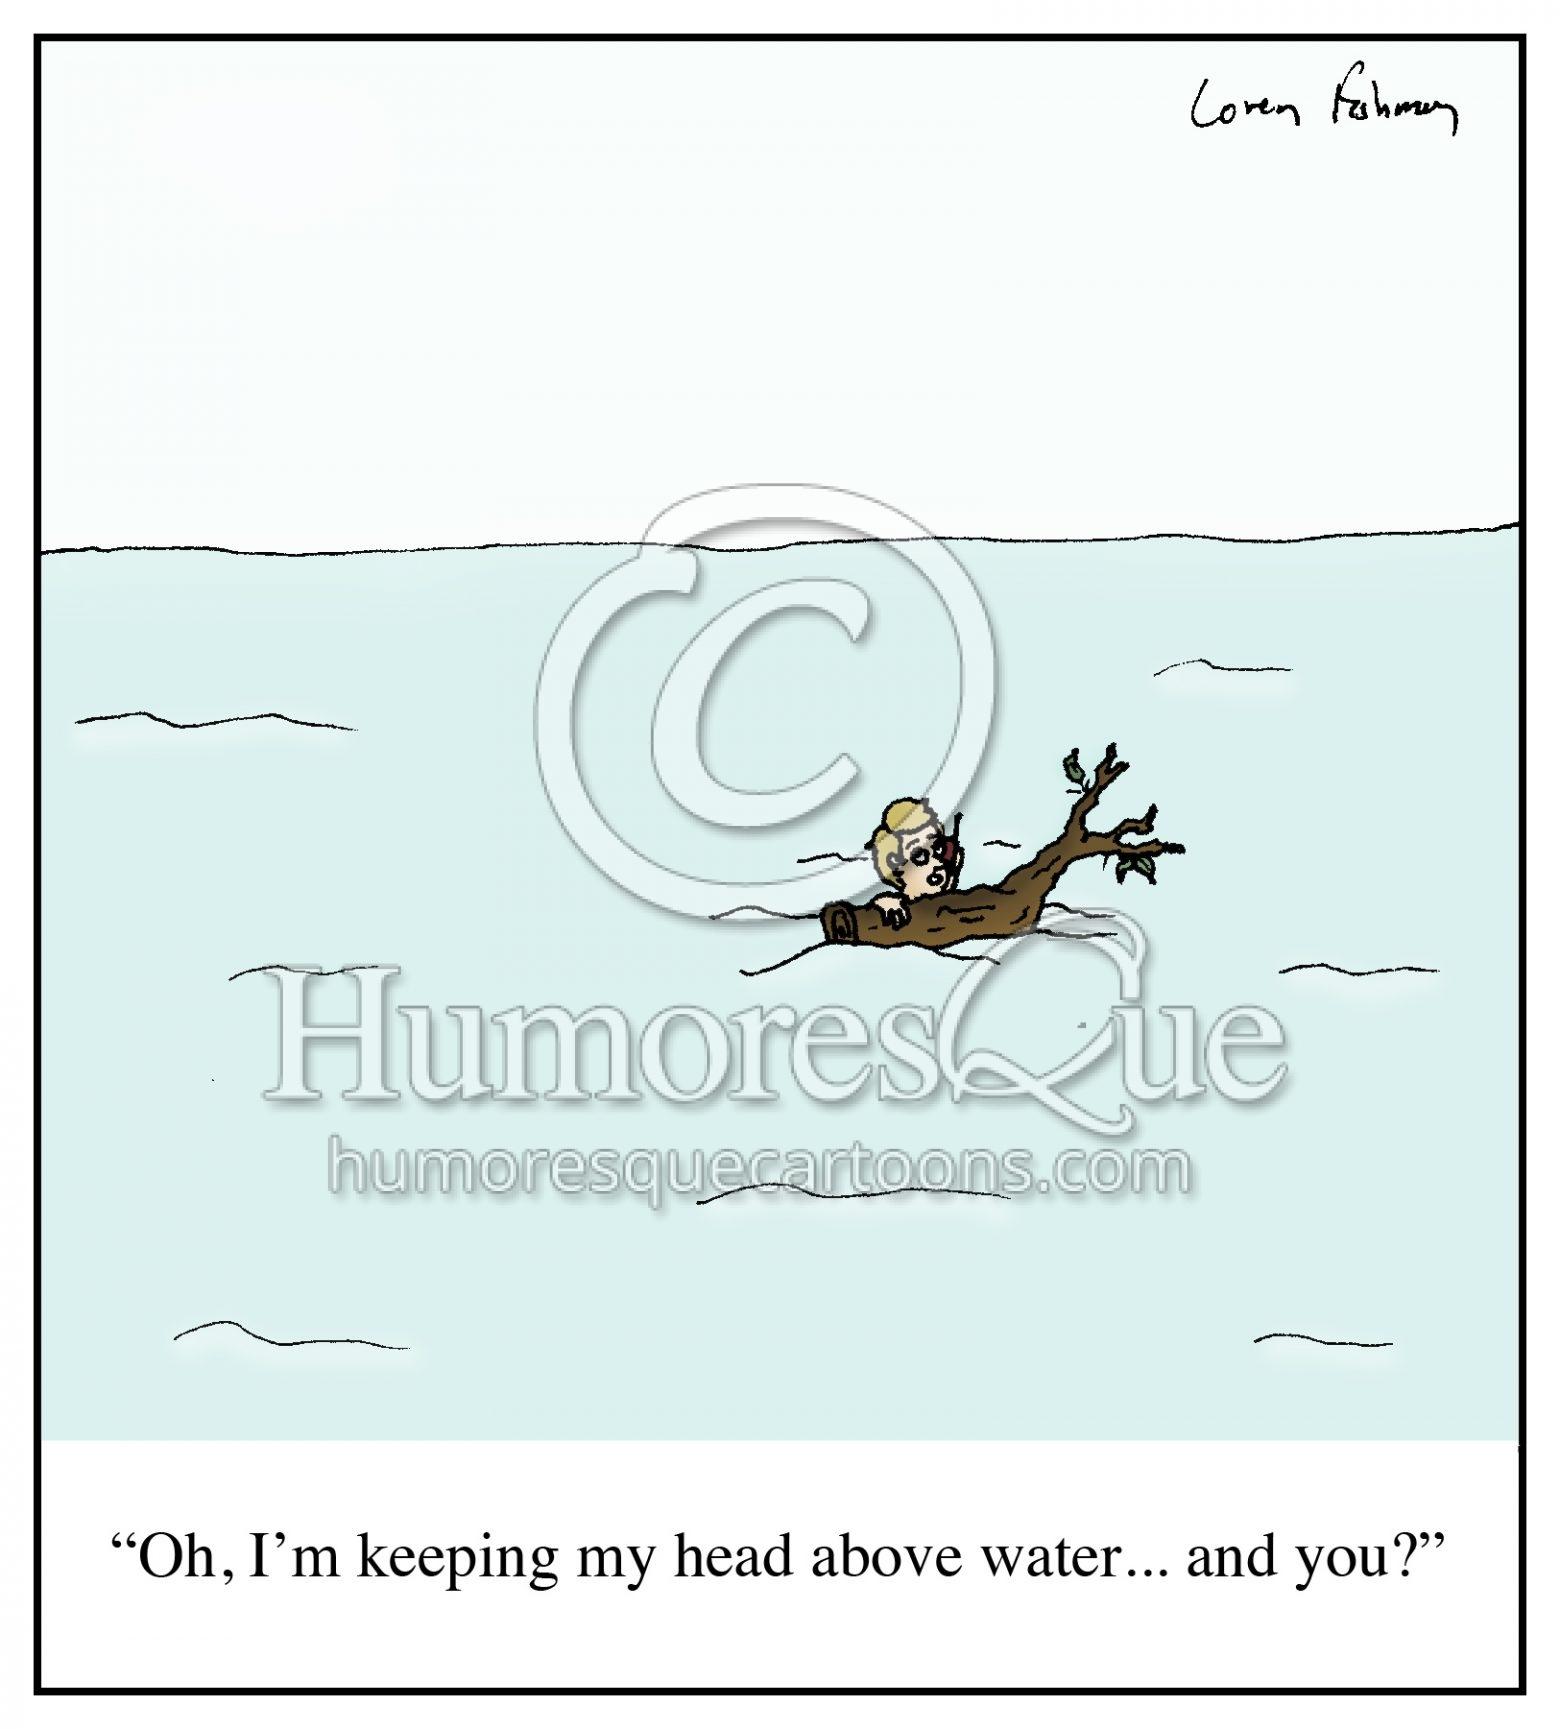 Head above water financial trouble cartoon